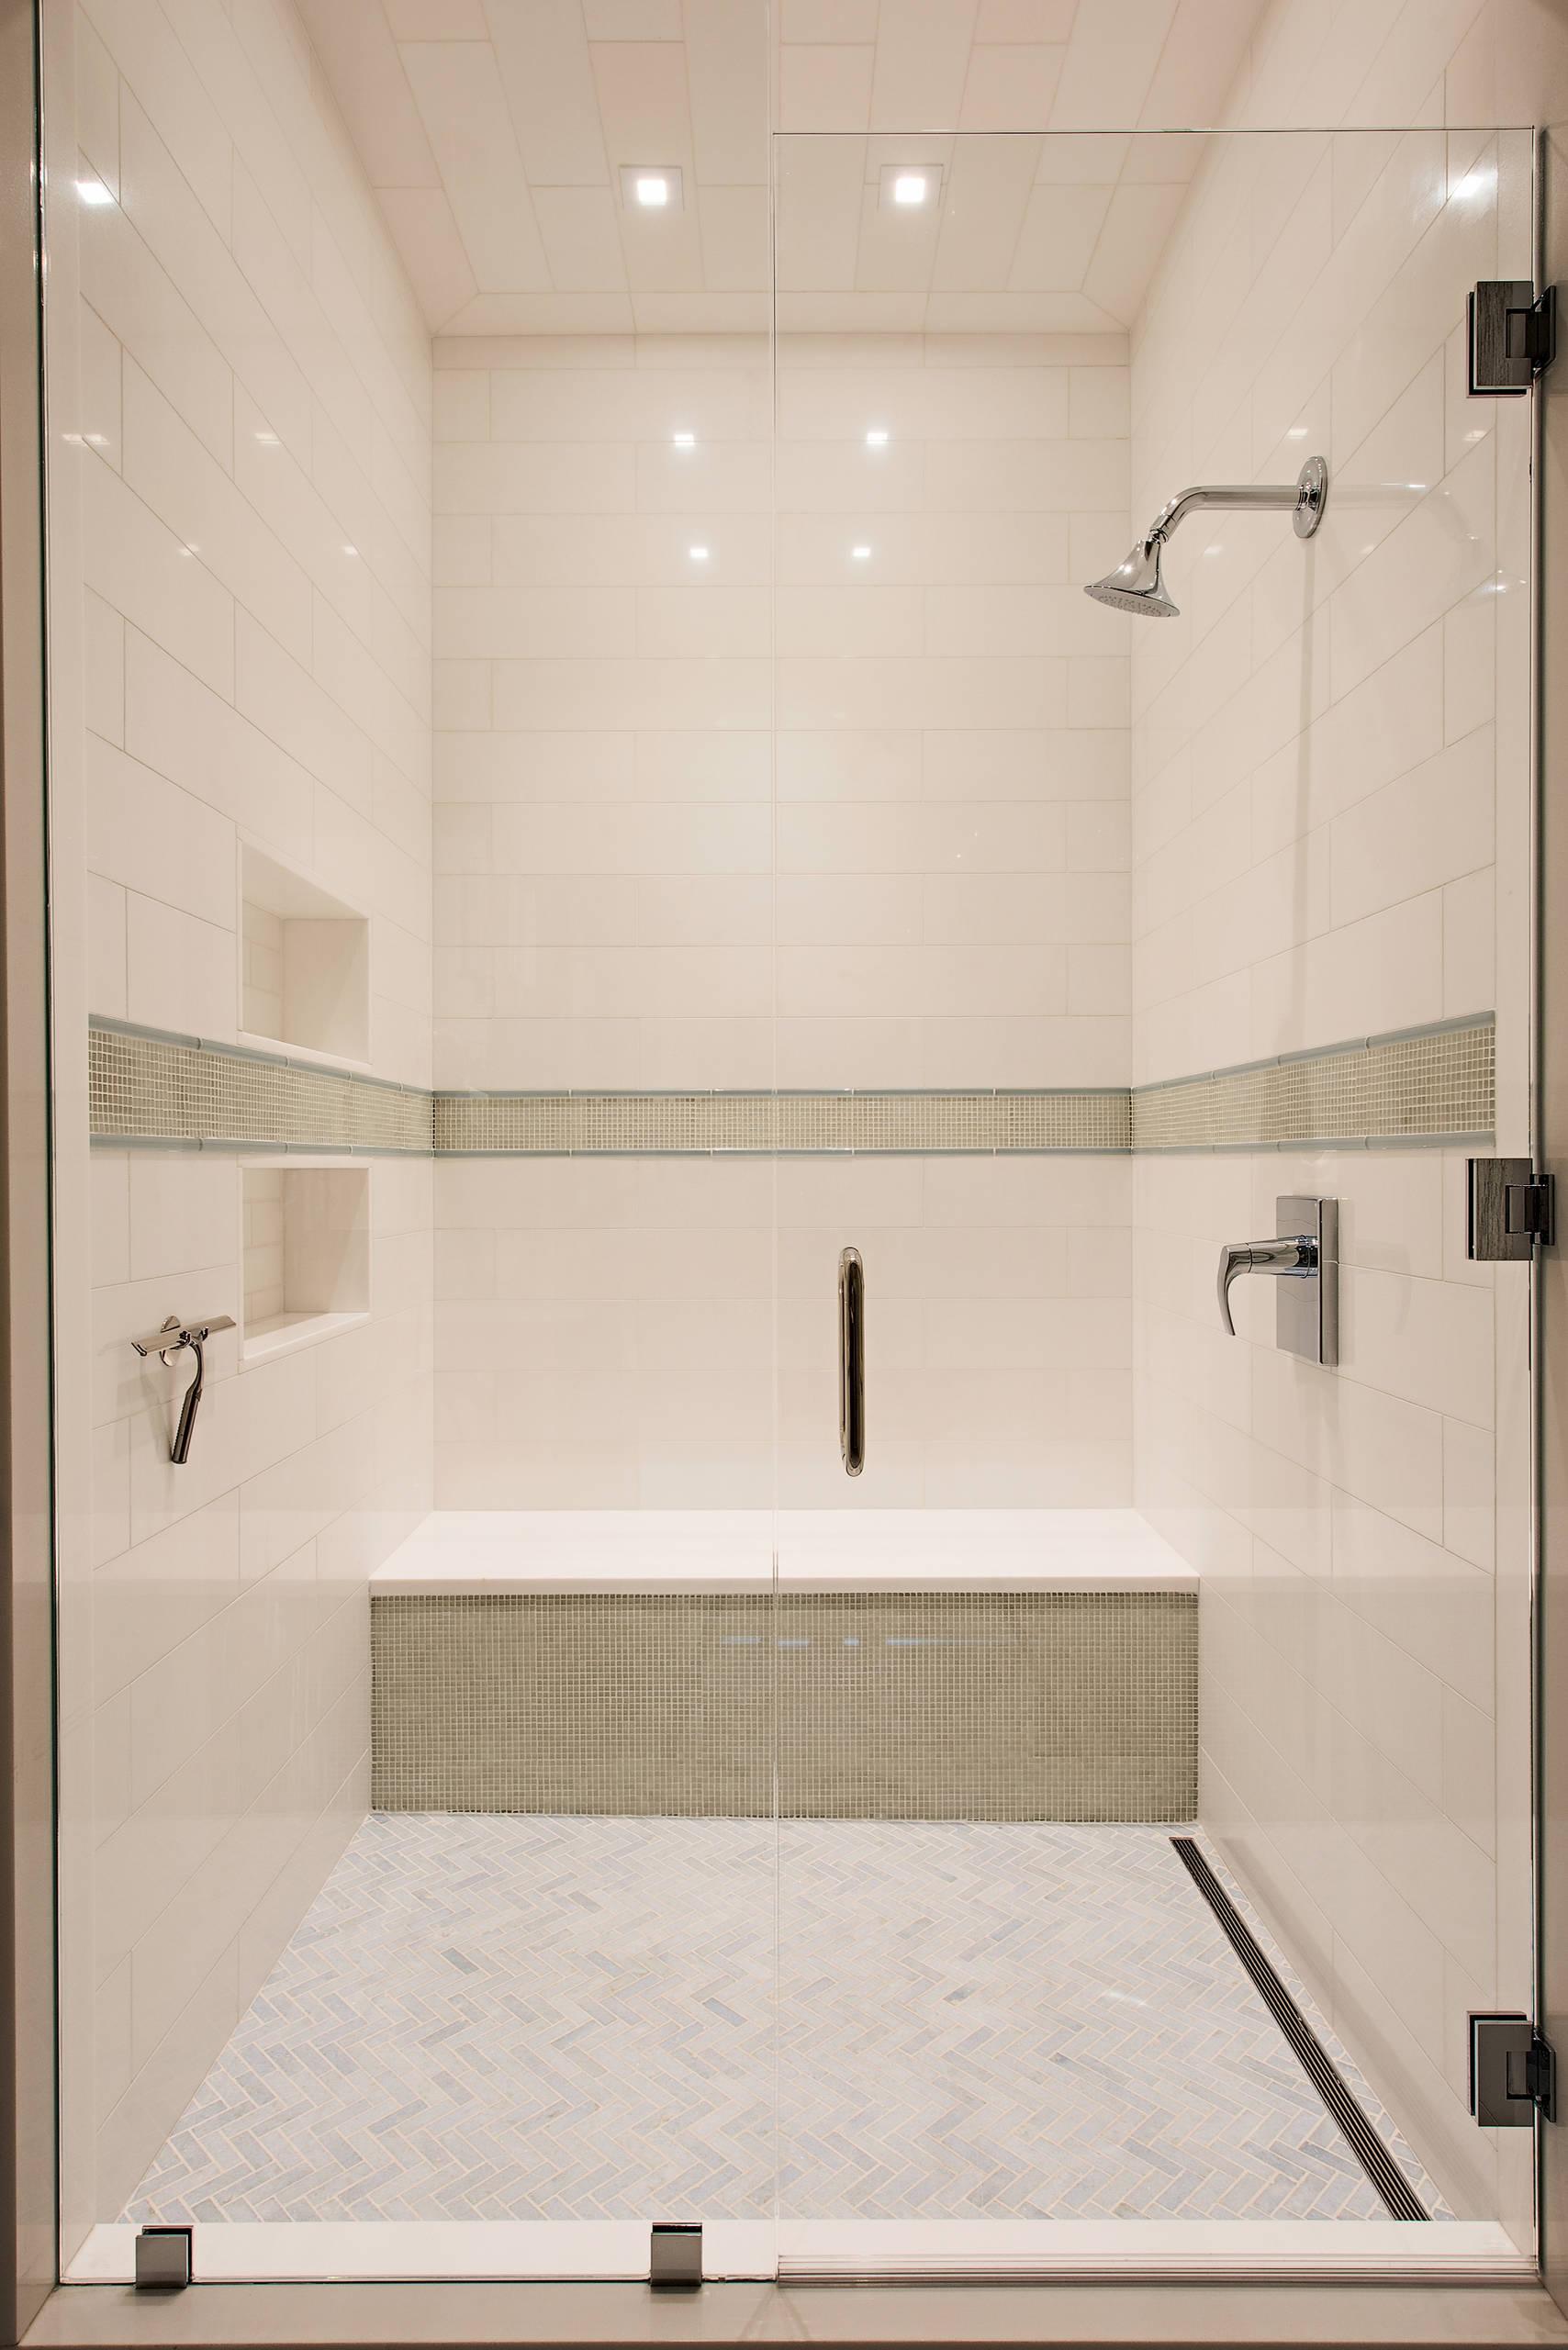 Certified Luxury Builders - 41 West - Veracruz Penthouse Baths